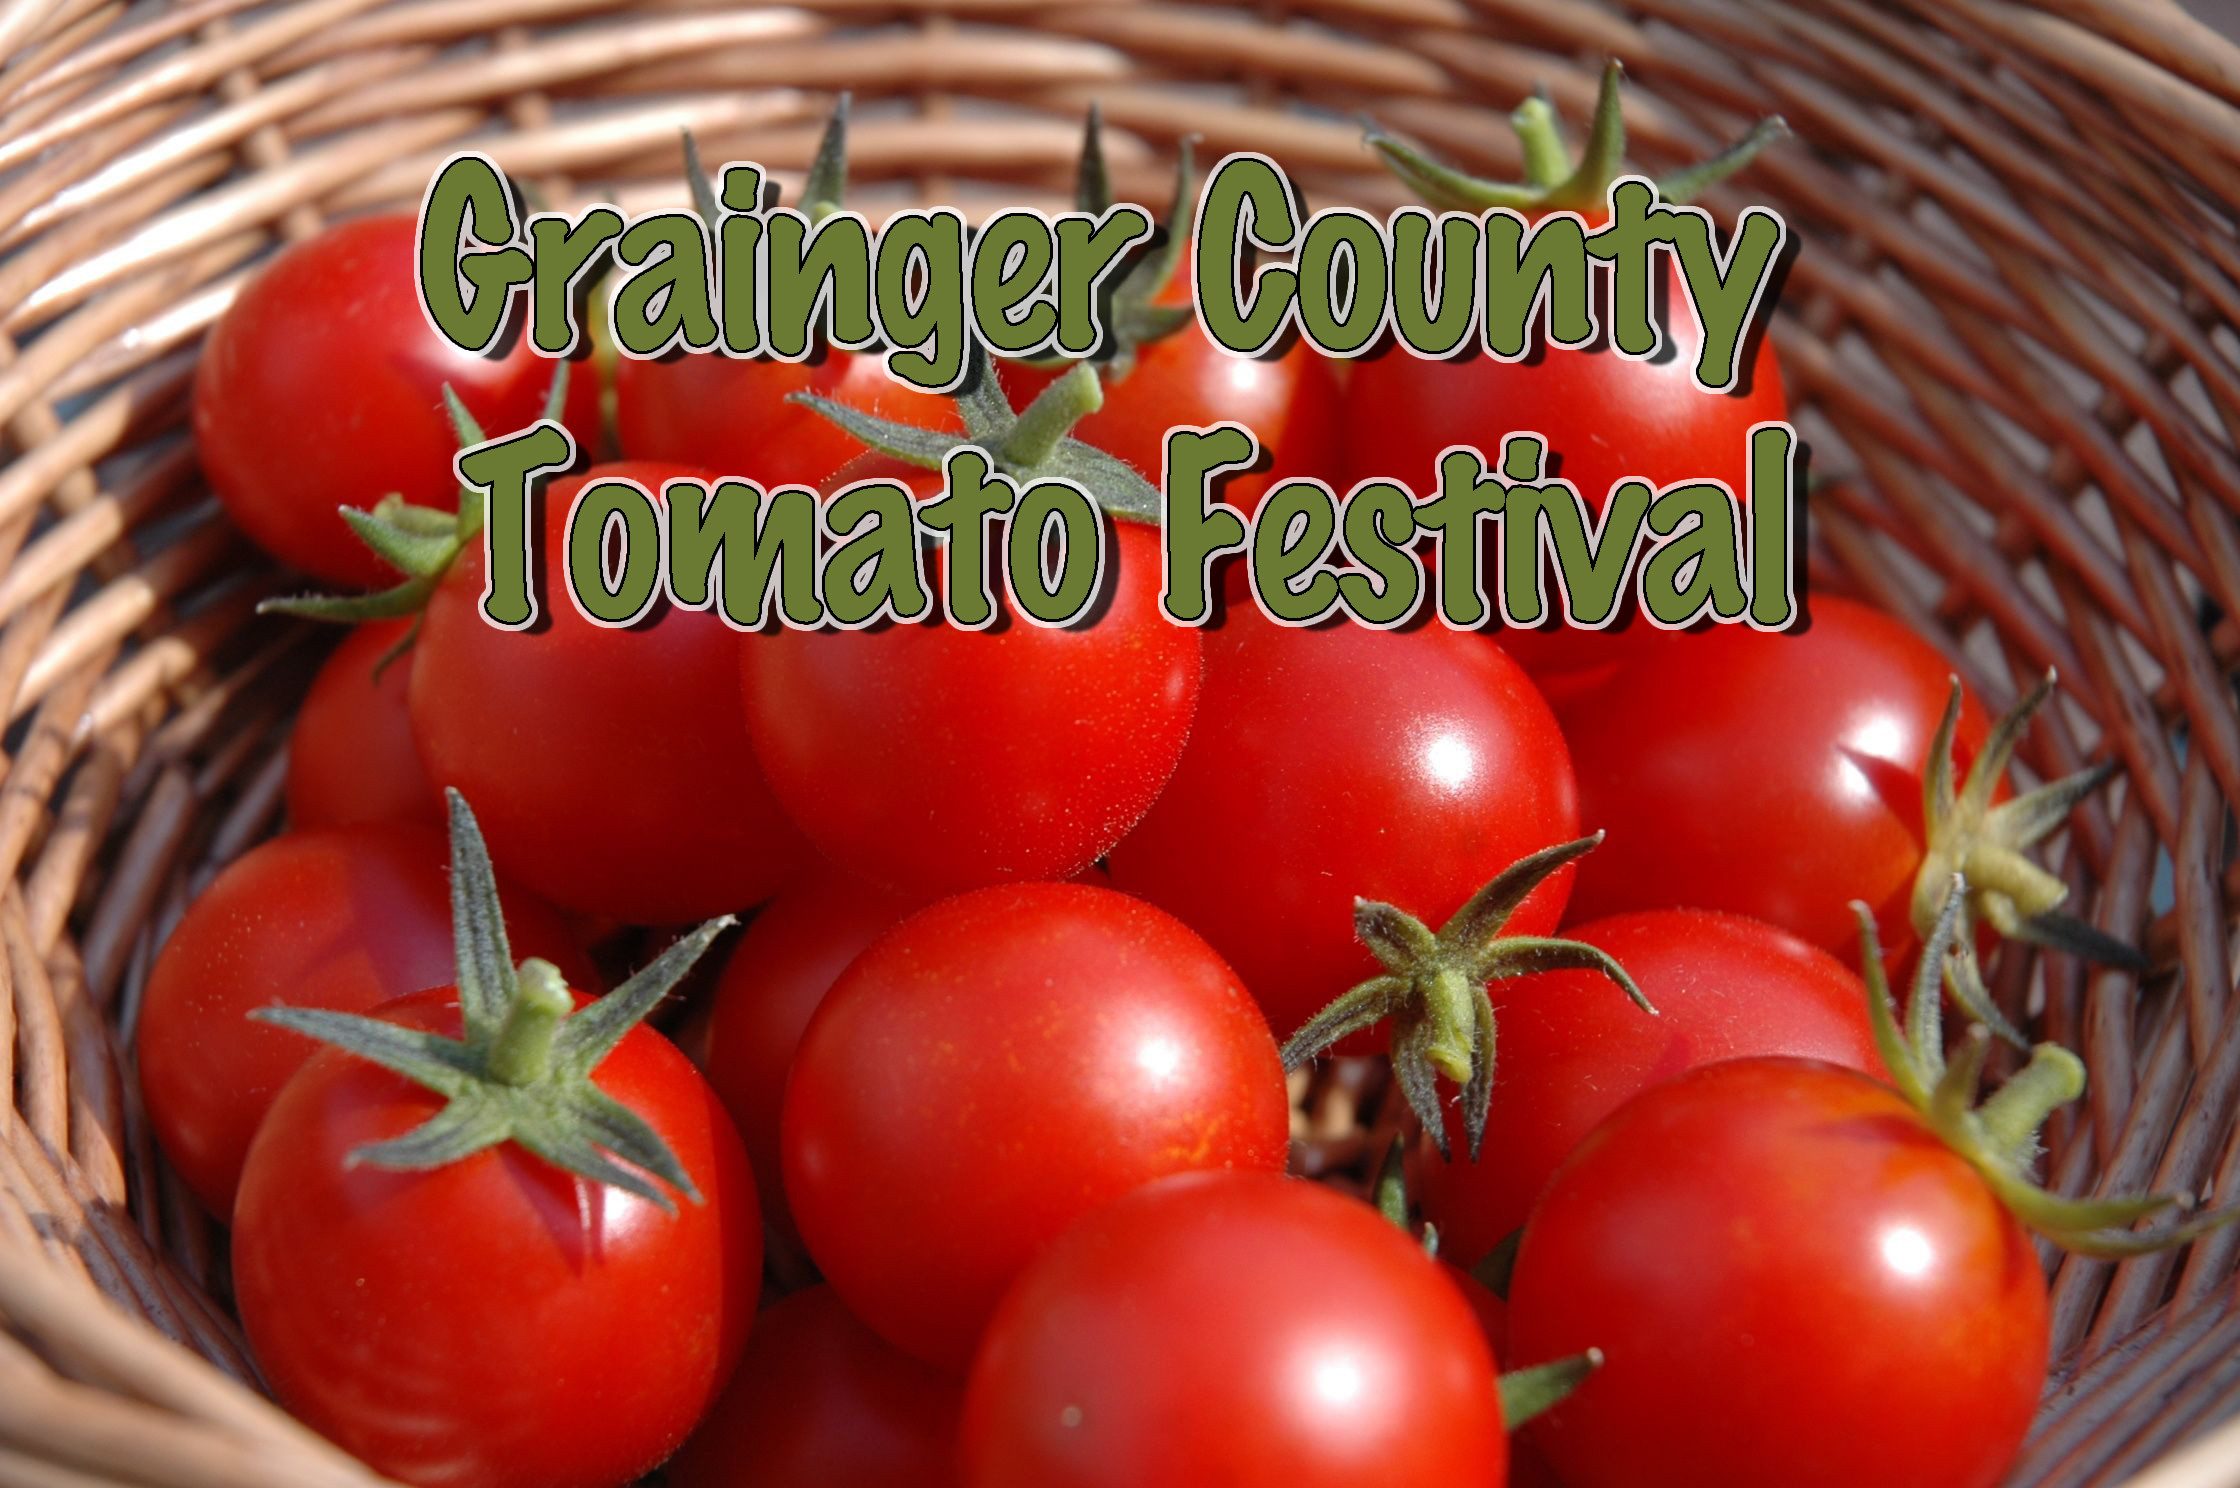 Grainger County Tomato Festival  Grainger County Tomato Festival is going to be a delicious